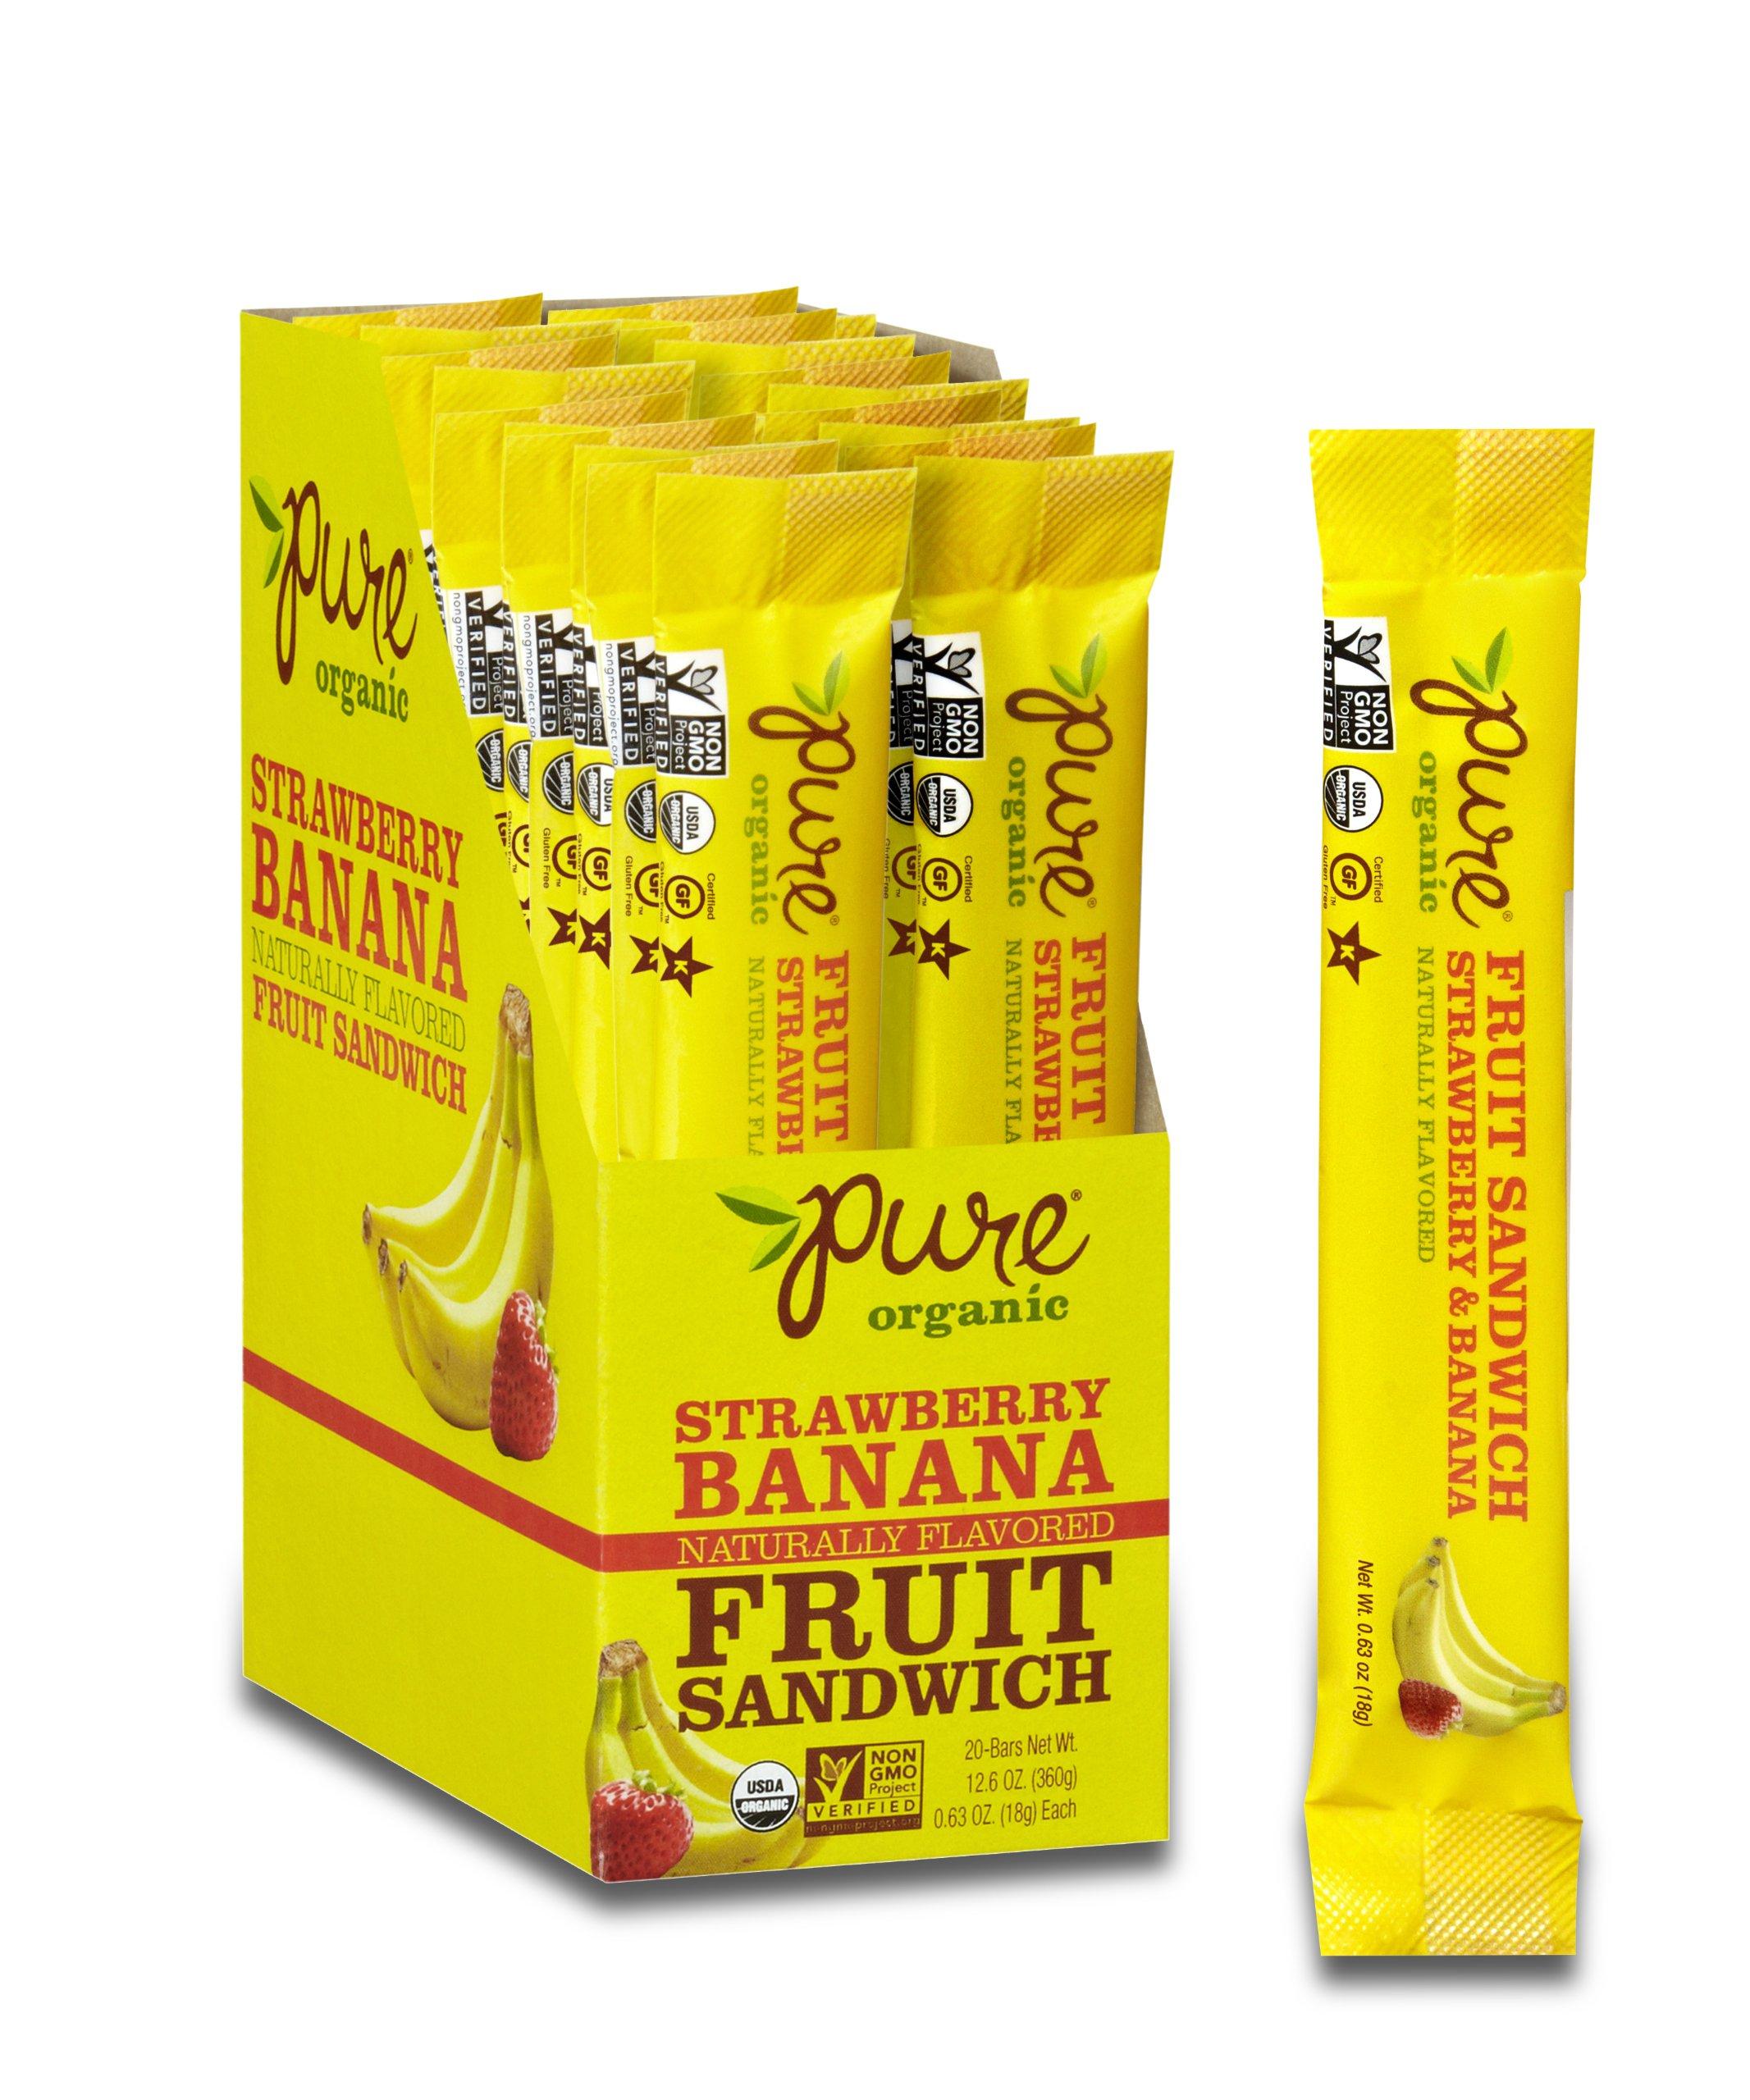 Pure Organic Strawberry Banana Layered Fruit Bar, Certified Organic, Gluten-Free, Non-GMO, Vegan, Kosher, Peanut Free,  No artificial Ingredeints Fruit Snack, 0.63 ounce (Pack of 20)